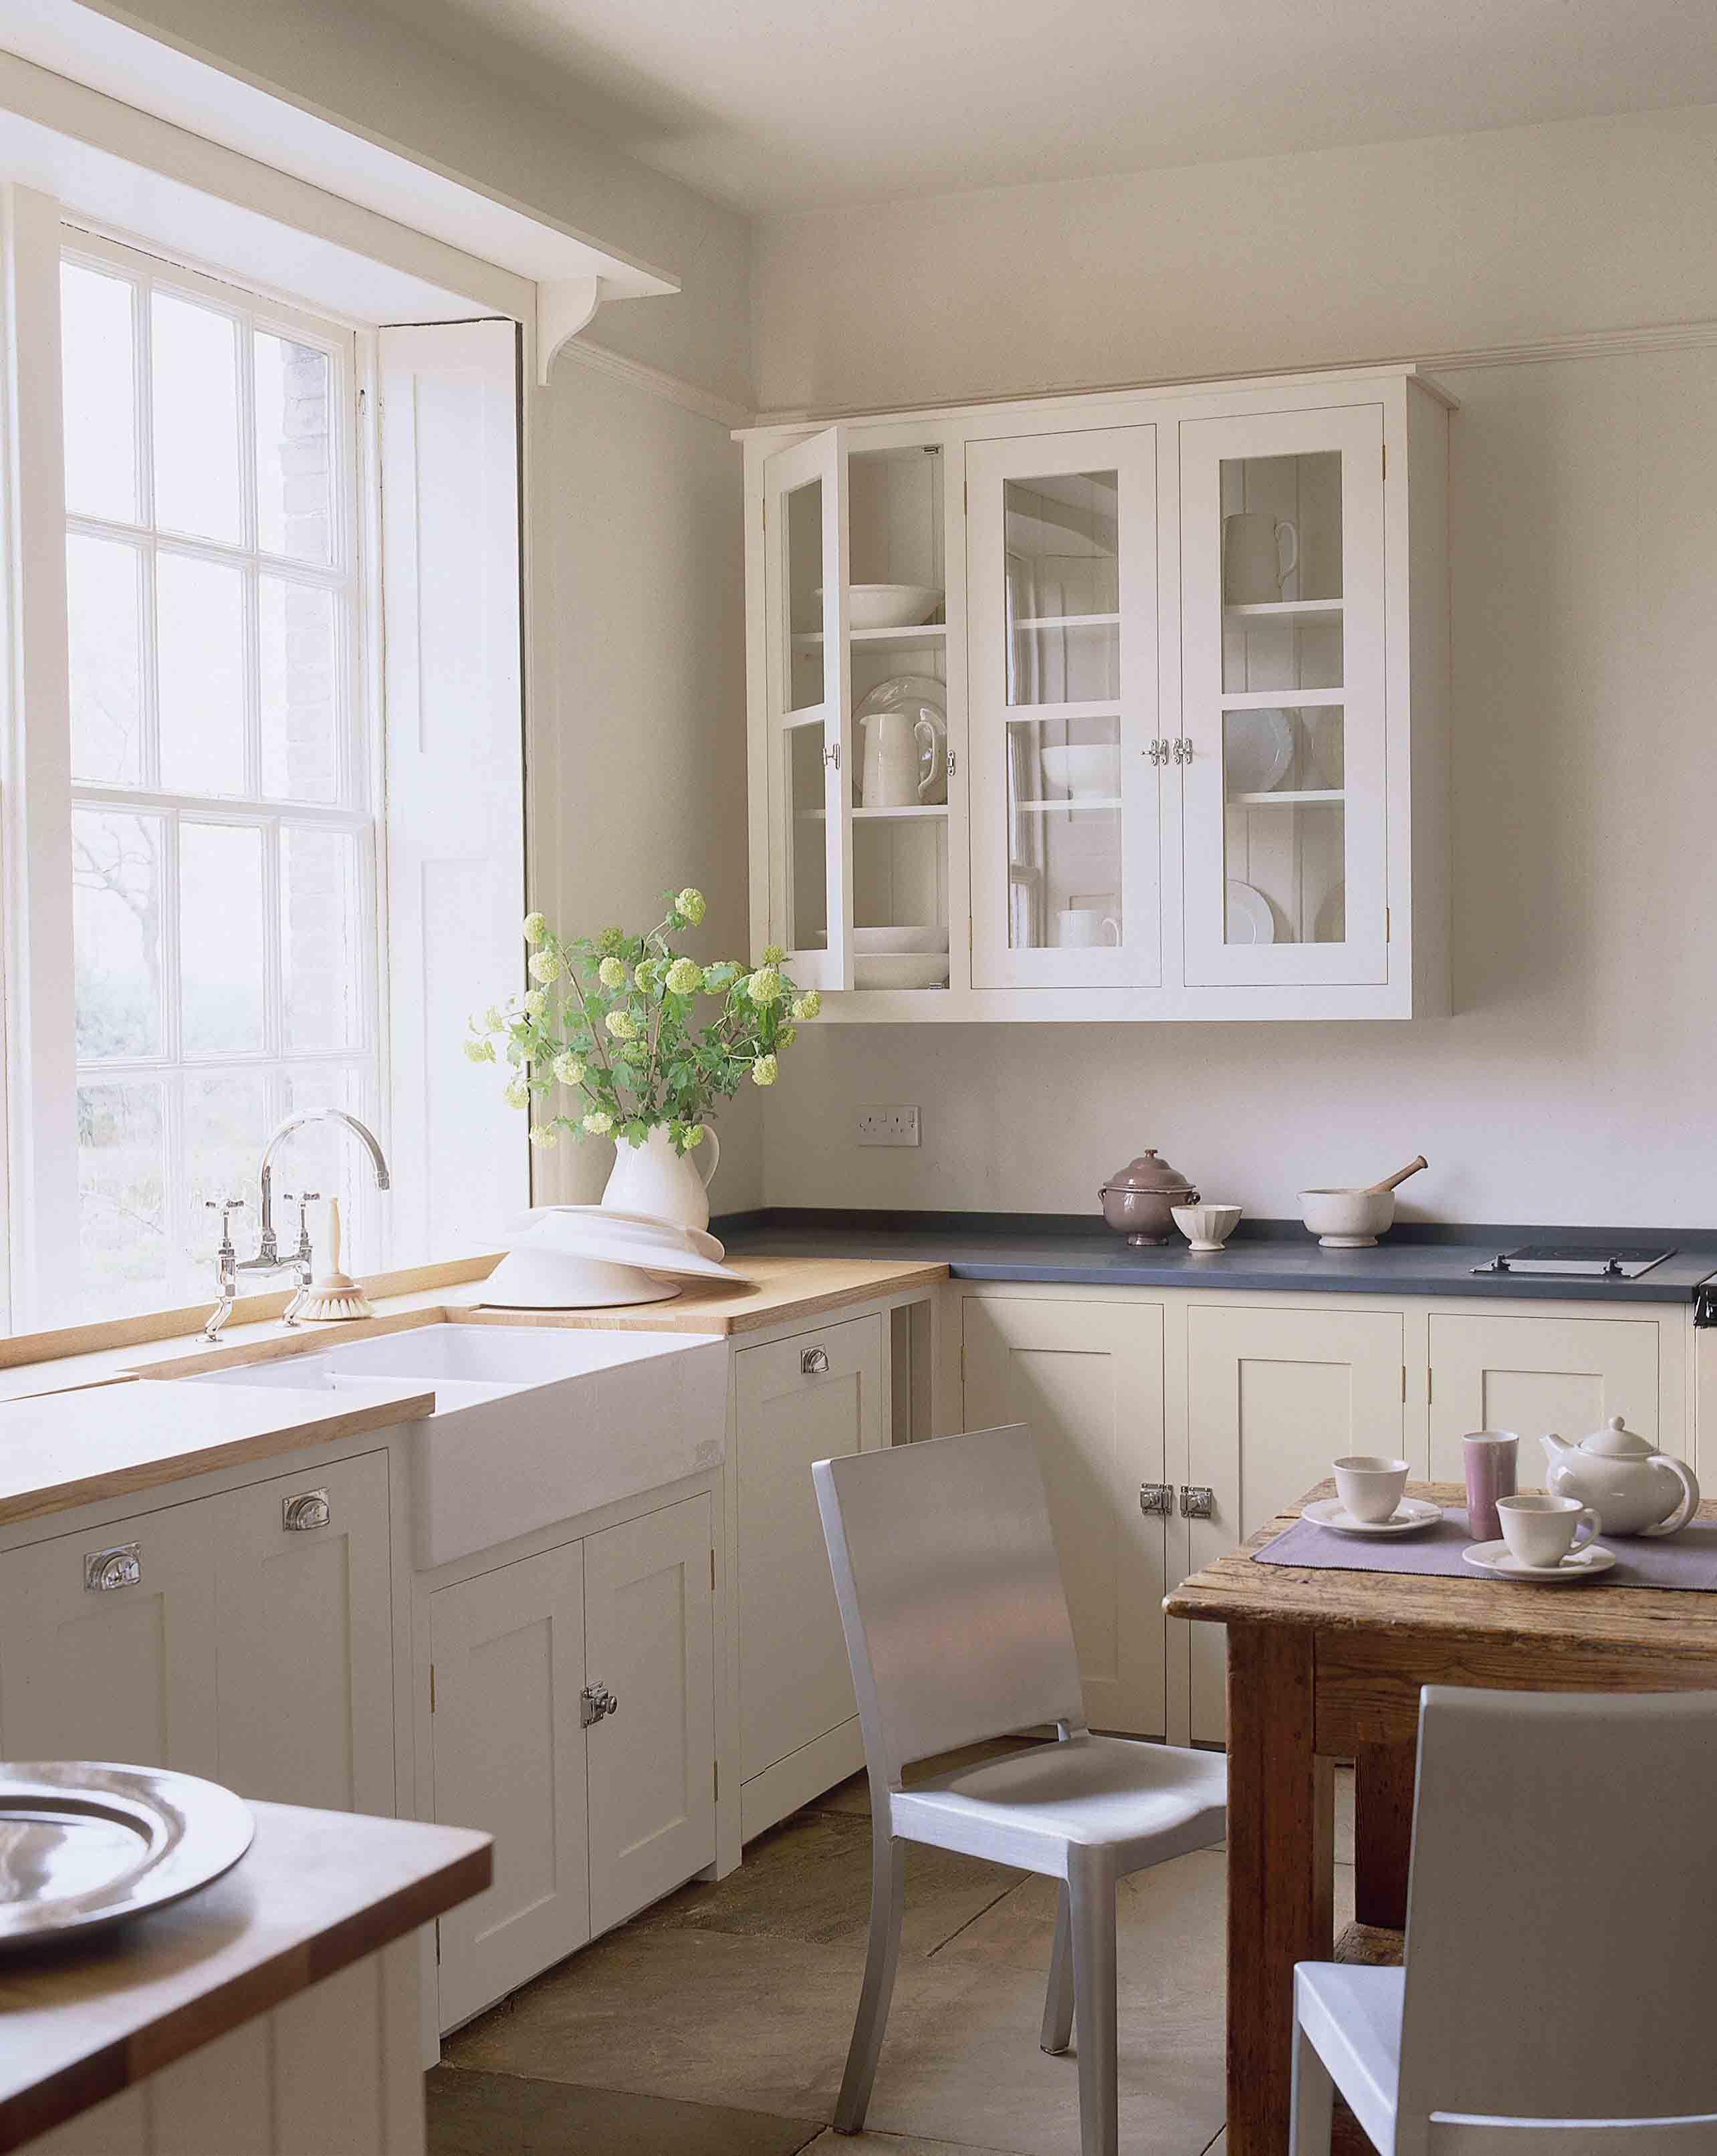 farmhouse kitchen designs uk. soapstone and white kitchen, big window, glass front upper cabinet farmhouse kitchen designs uk